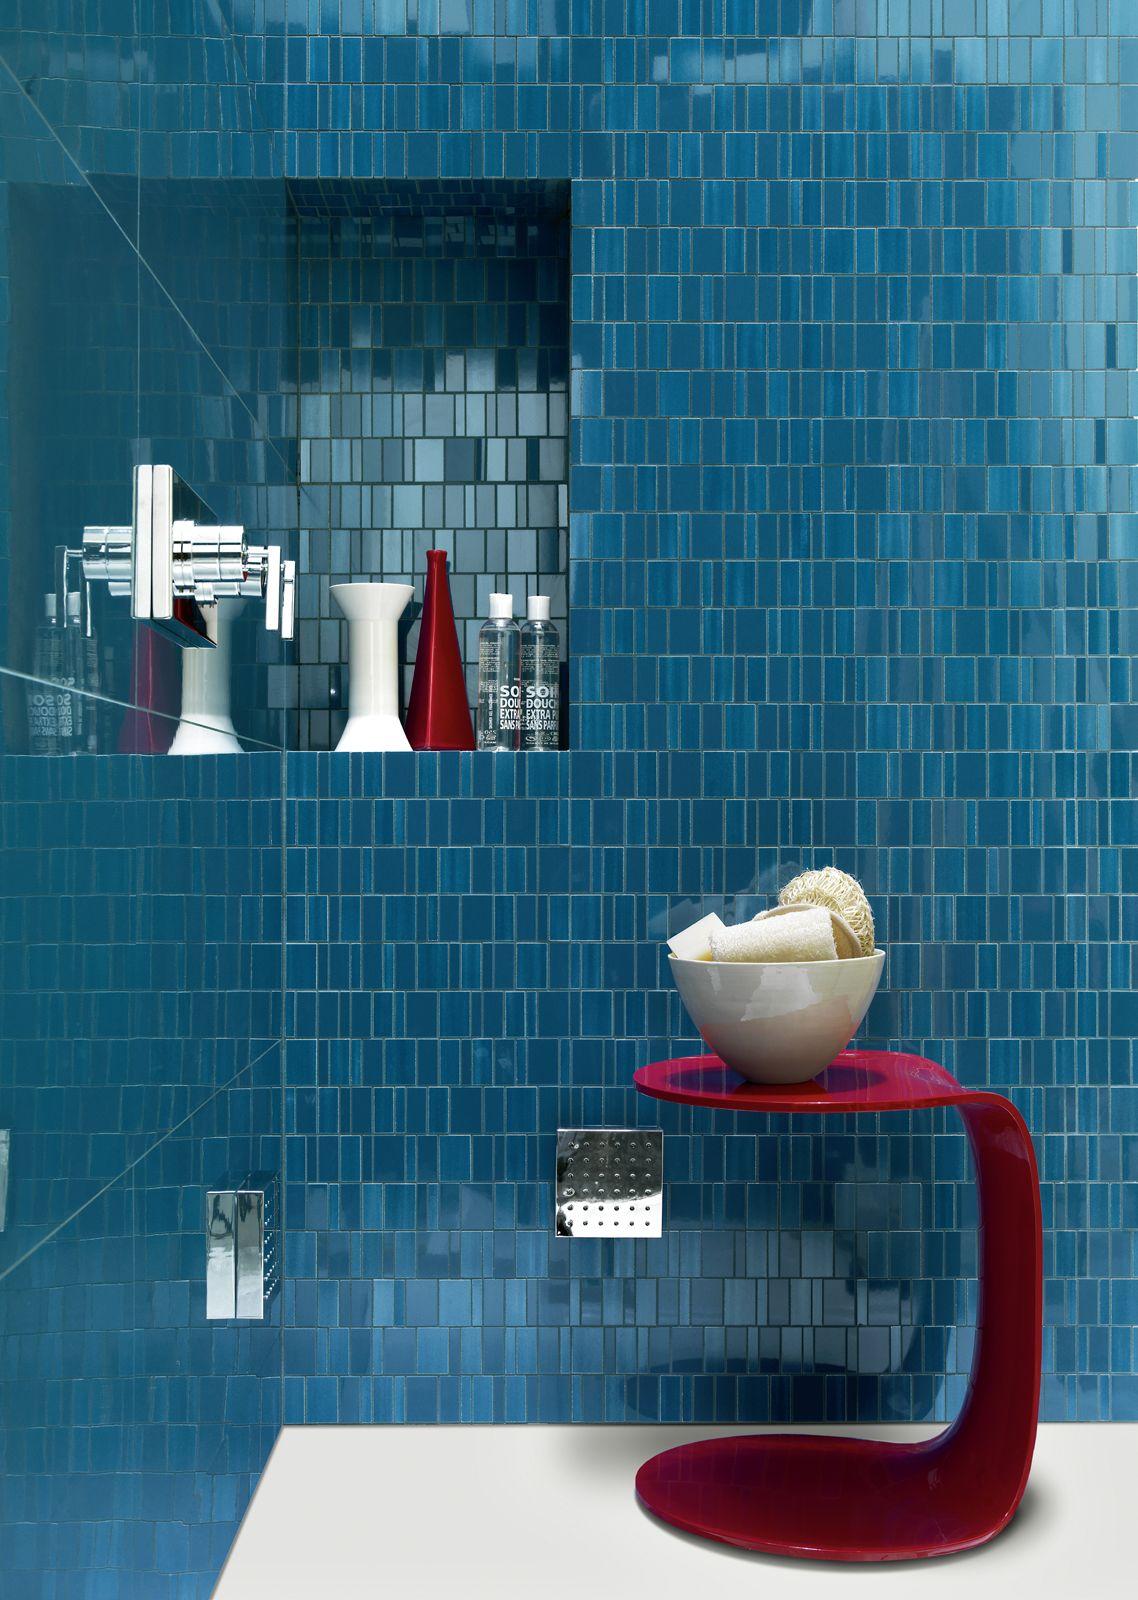 Bathroom flooring ceramic and porcelain stoneware marazzi bathroom flooring ceramic and porcelain stoneware marazzi colorful bathroomblue tilesresidential dailygadgetfo Gallery